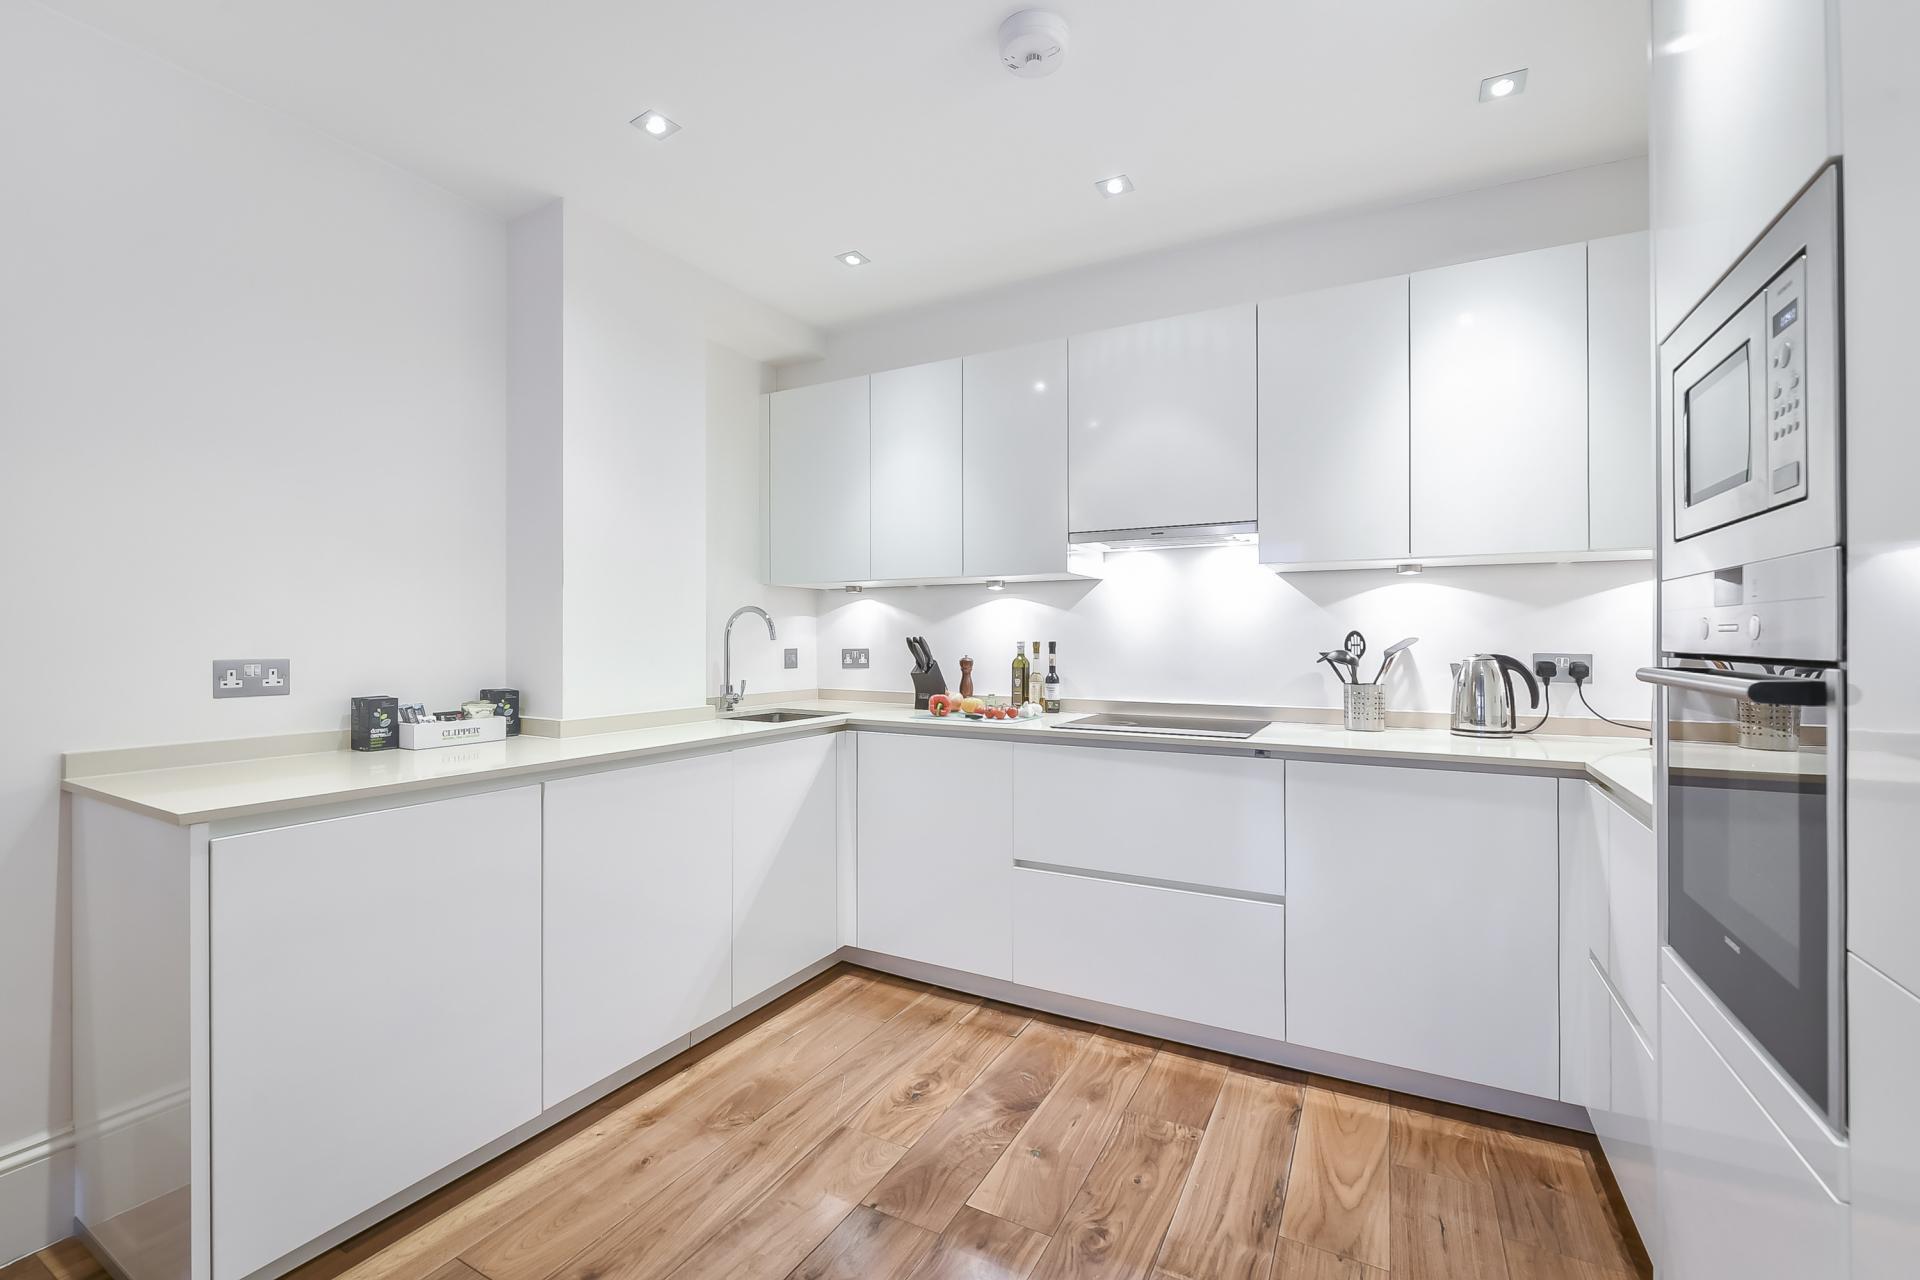 Kitchen at Tavistock Place Apartments, Fitzrovia, London - Citybase Apartments